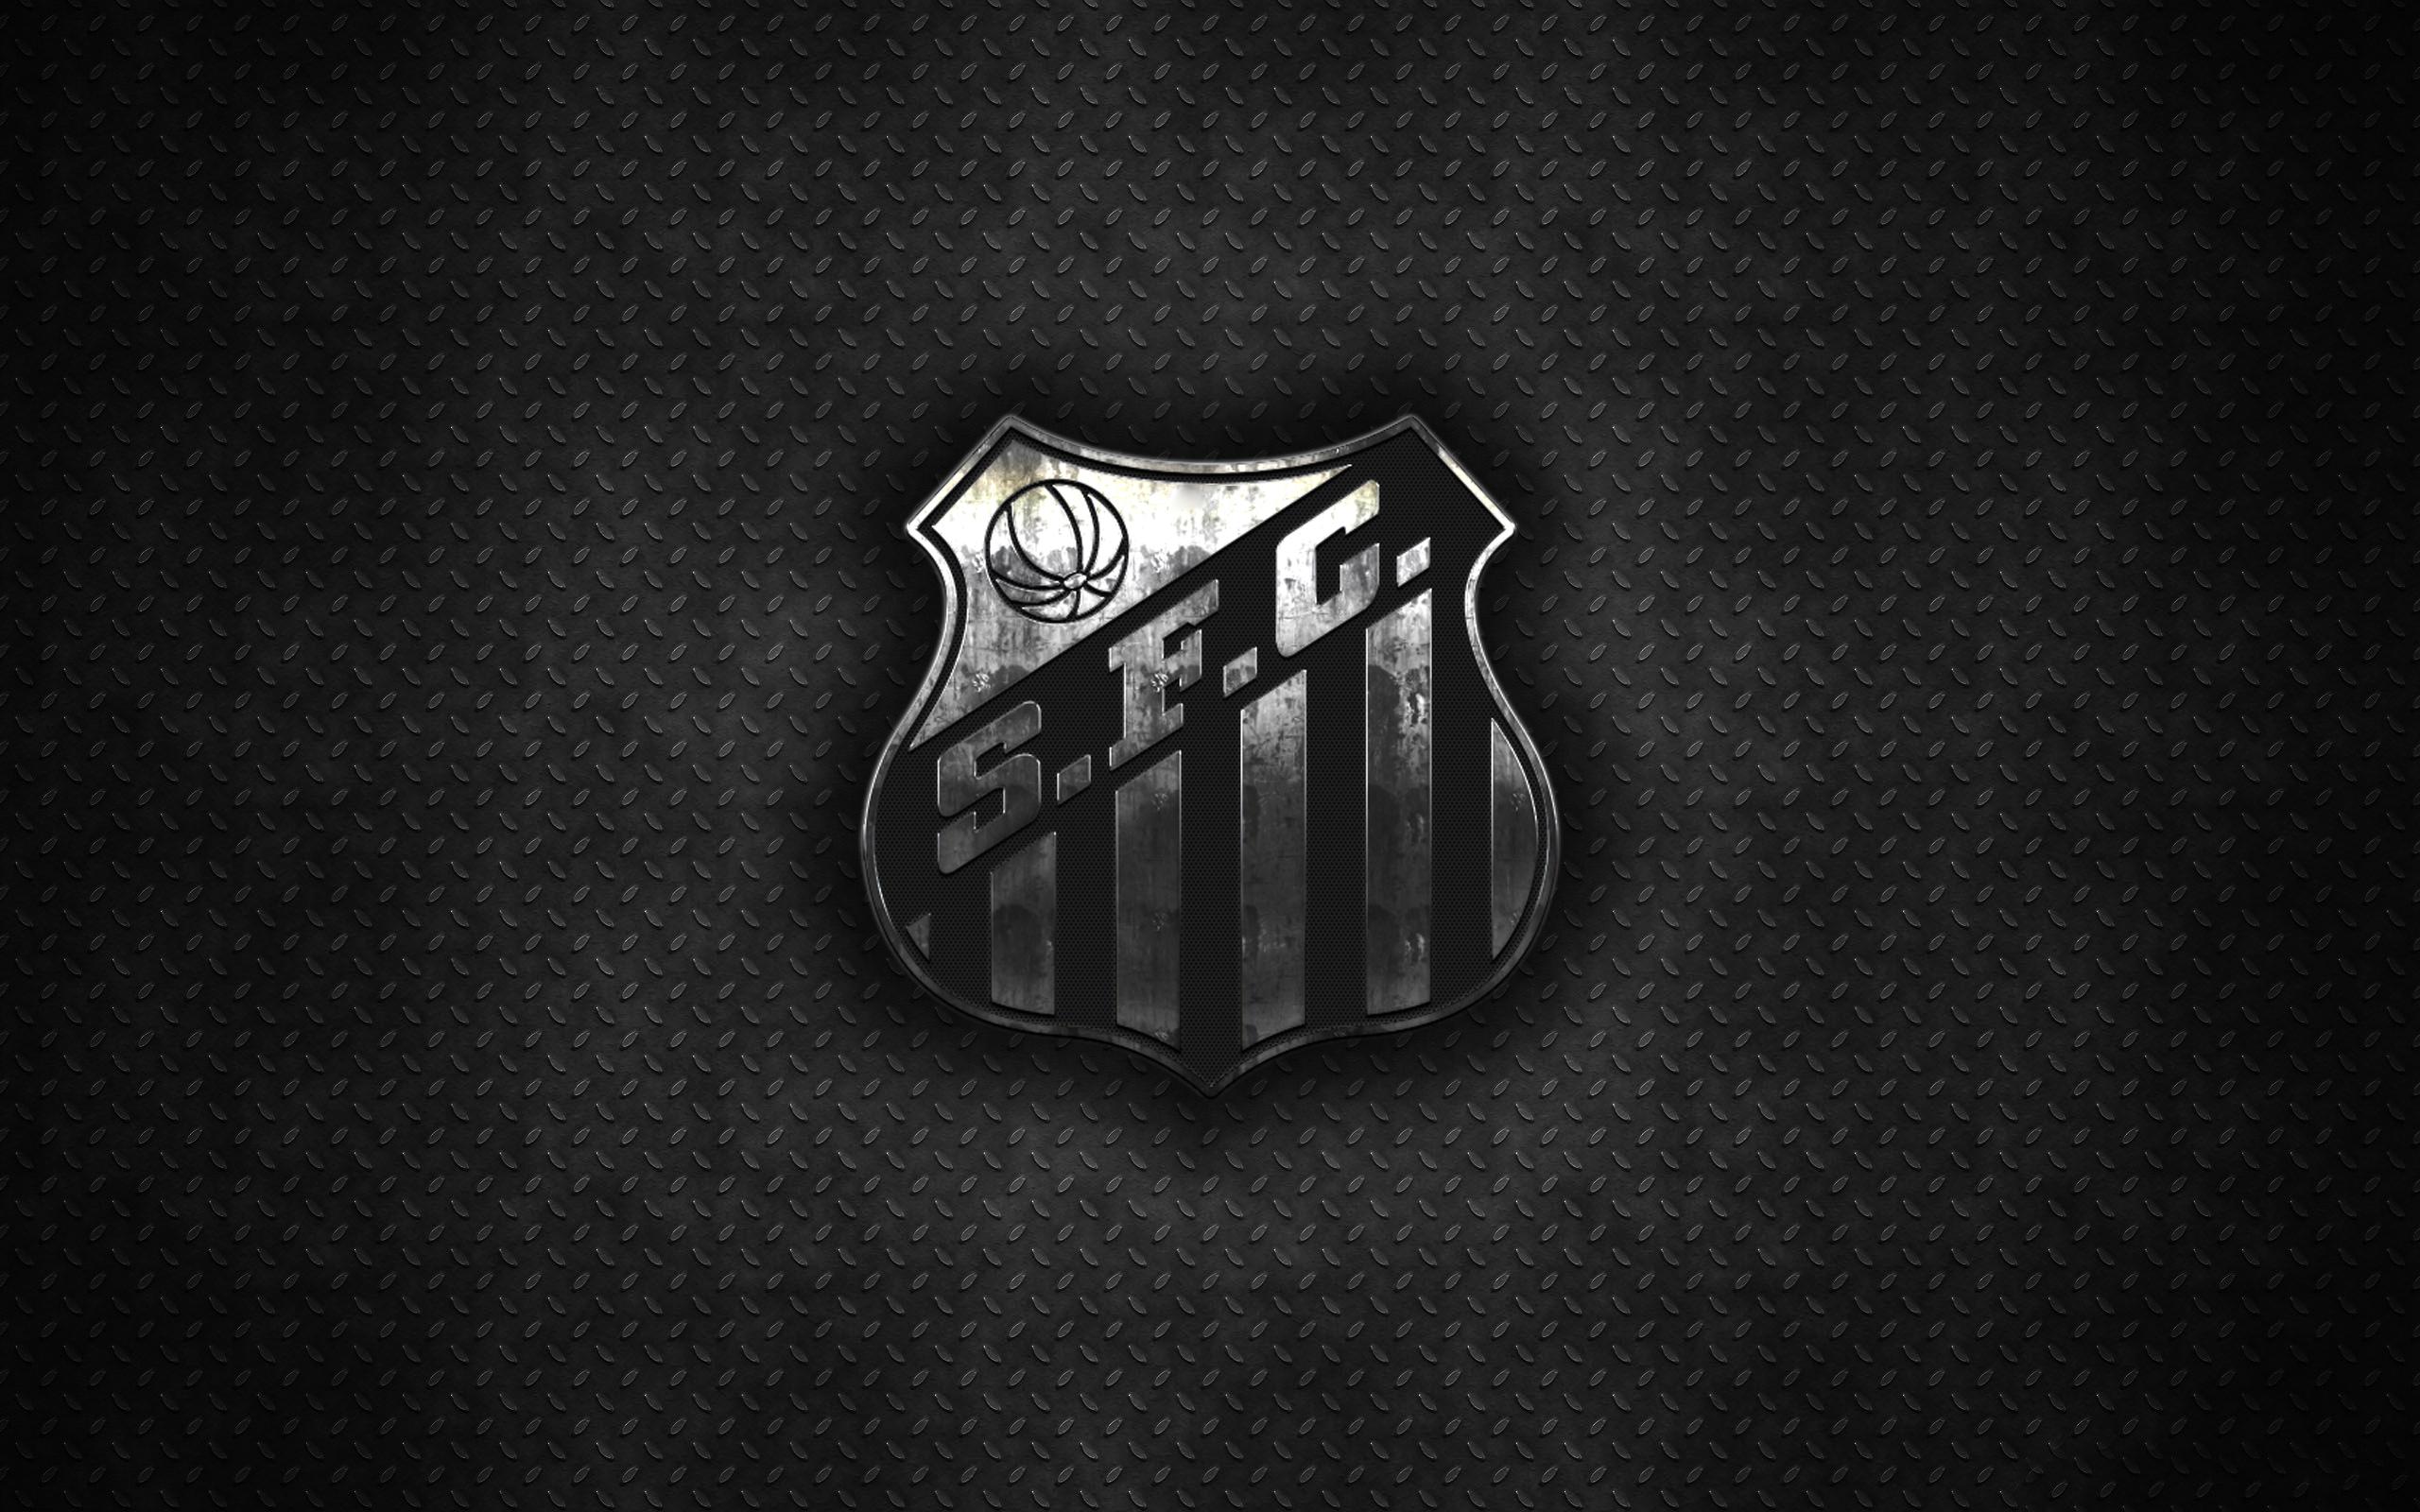 Santos FC HD Wallpaper Background Image 2560x1600 ID985228 2560x1600